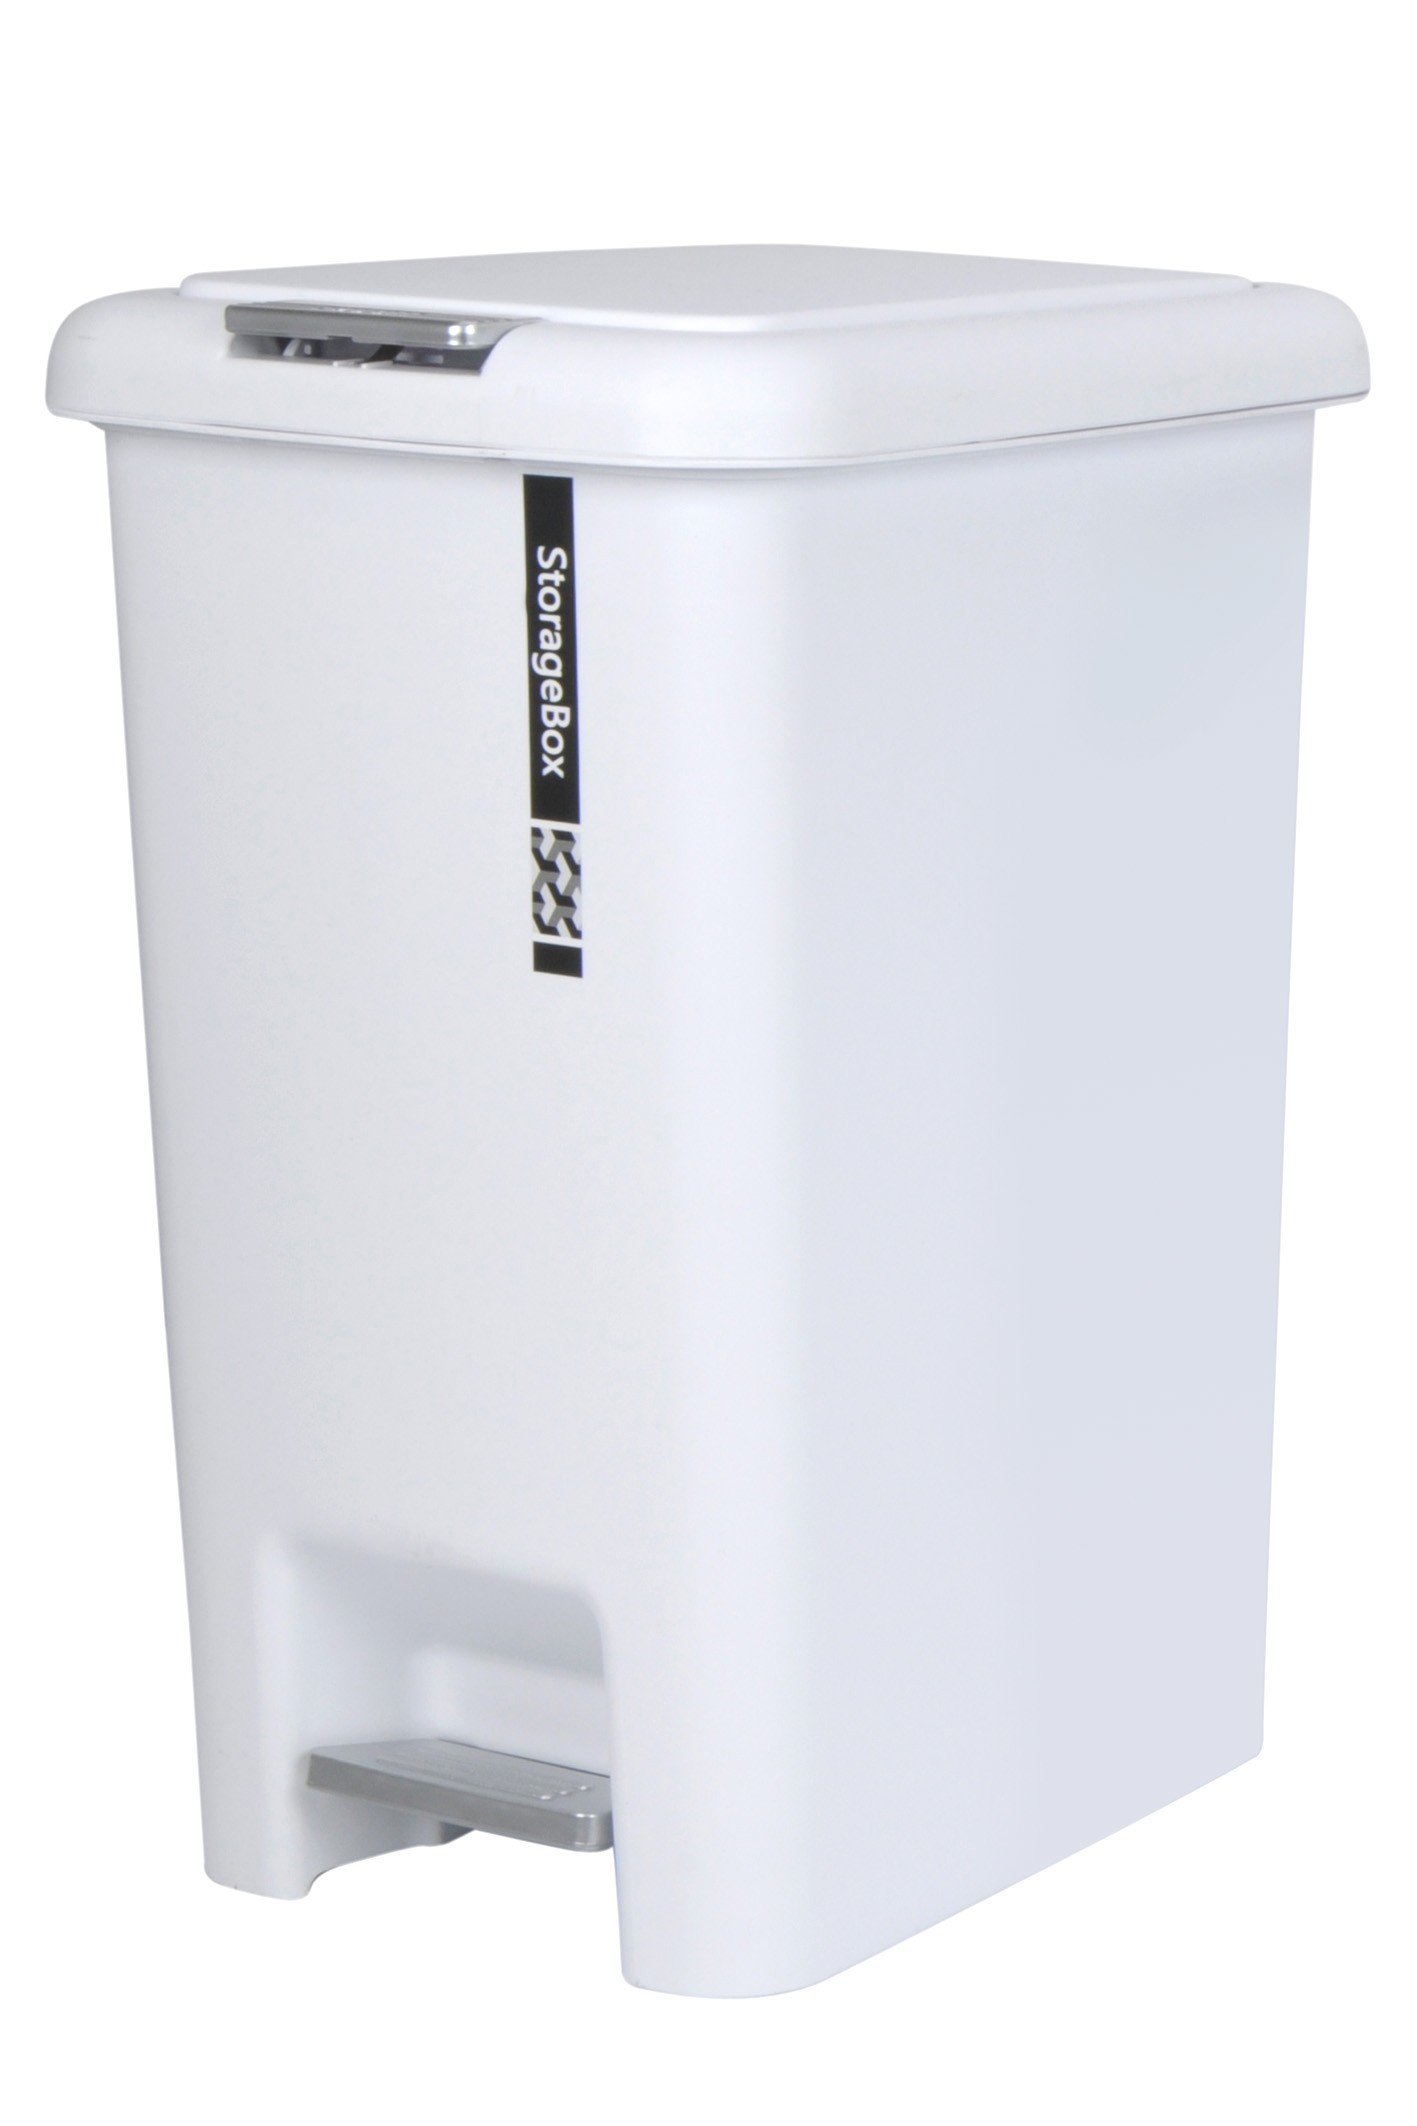 Plastic Pedal Bin 20l White From Storage Box